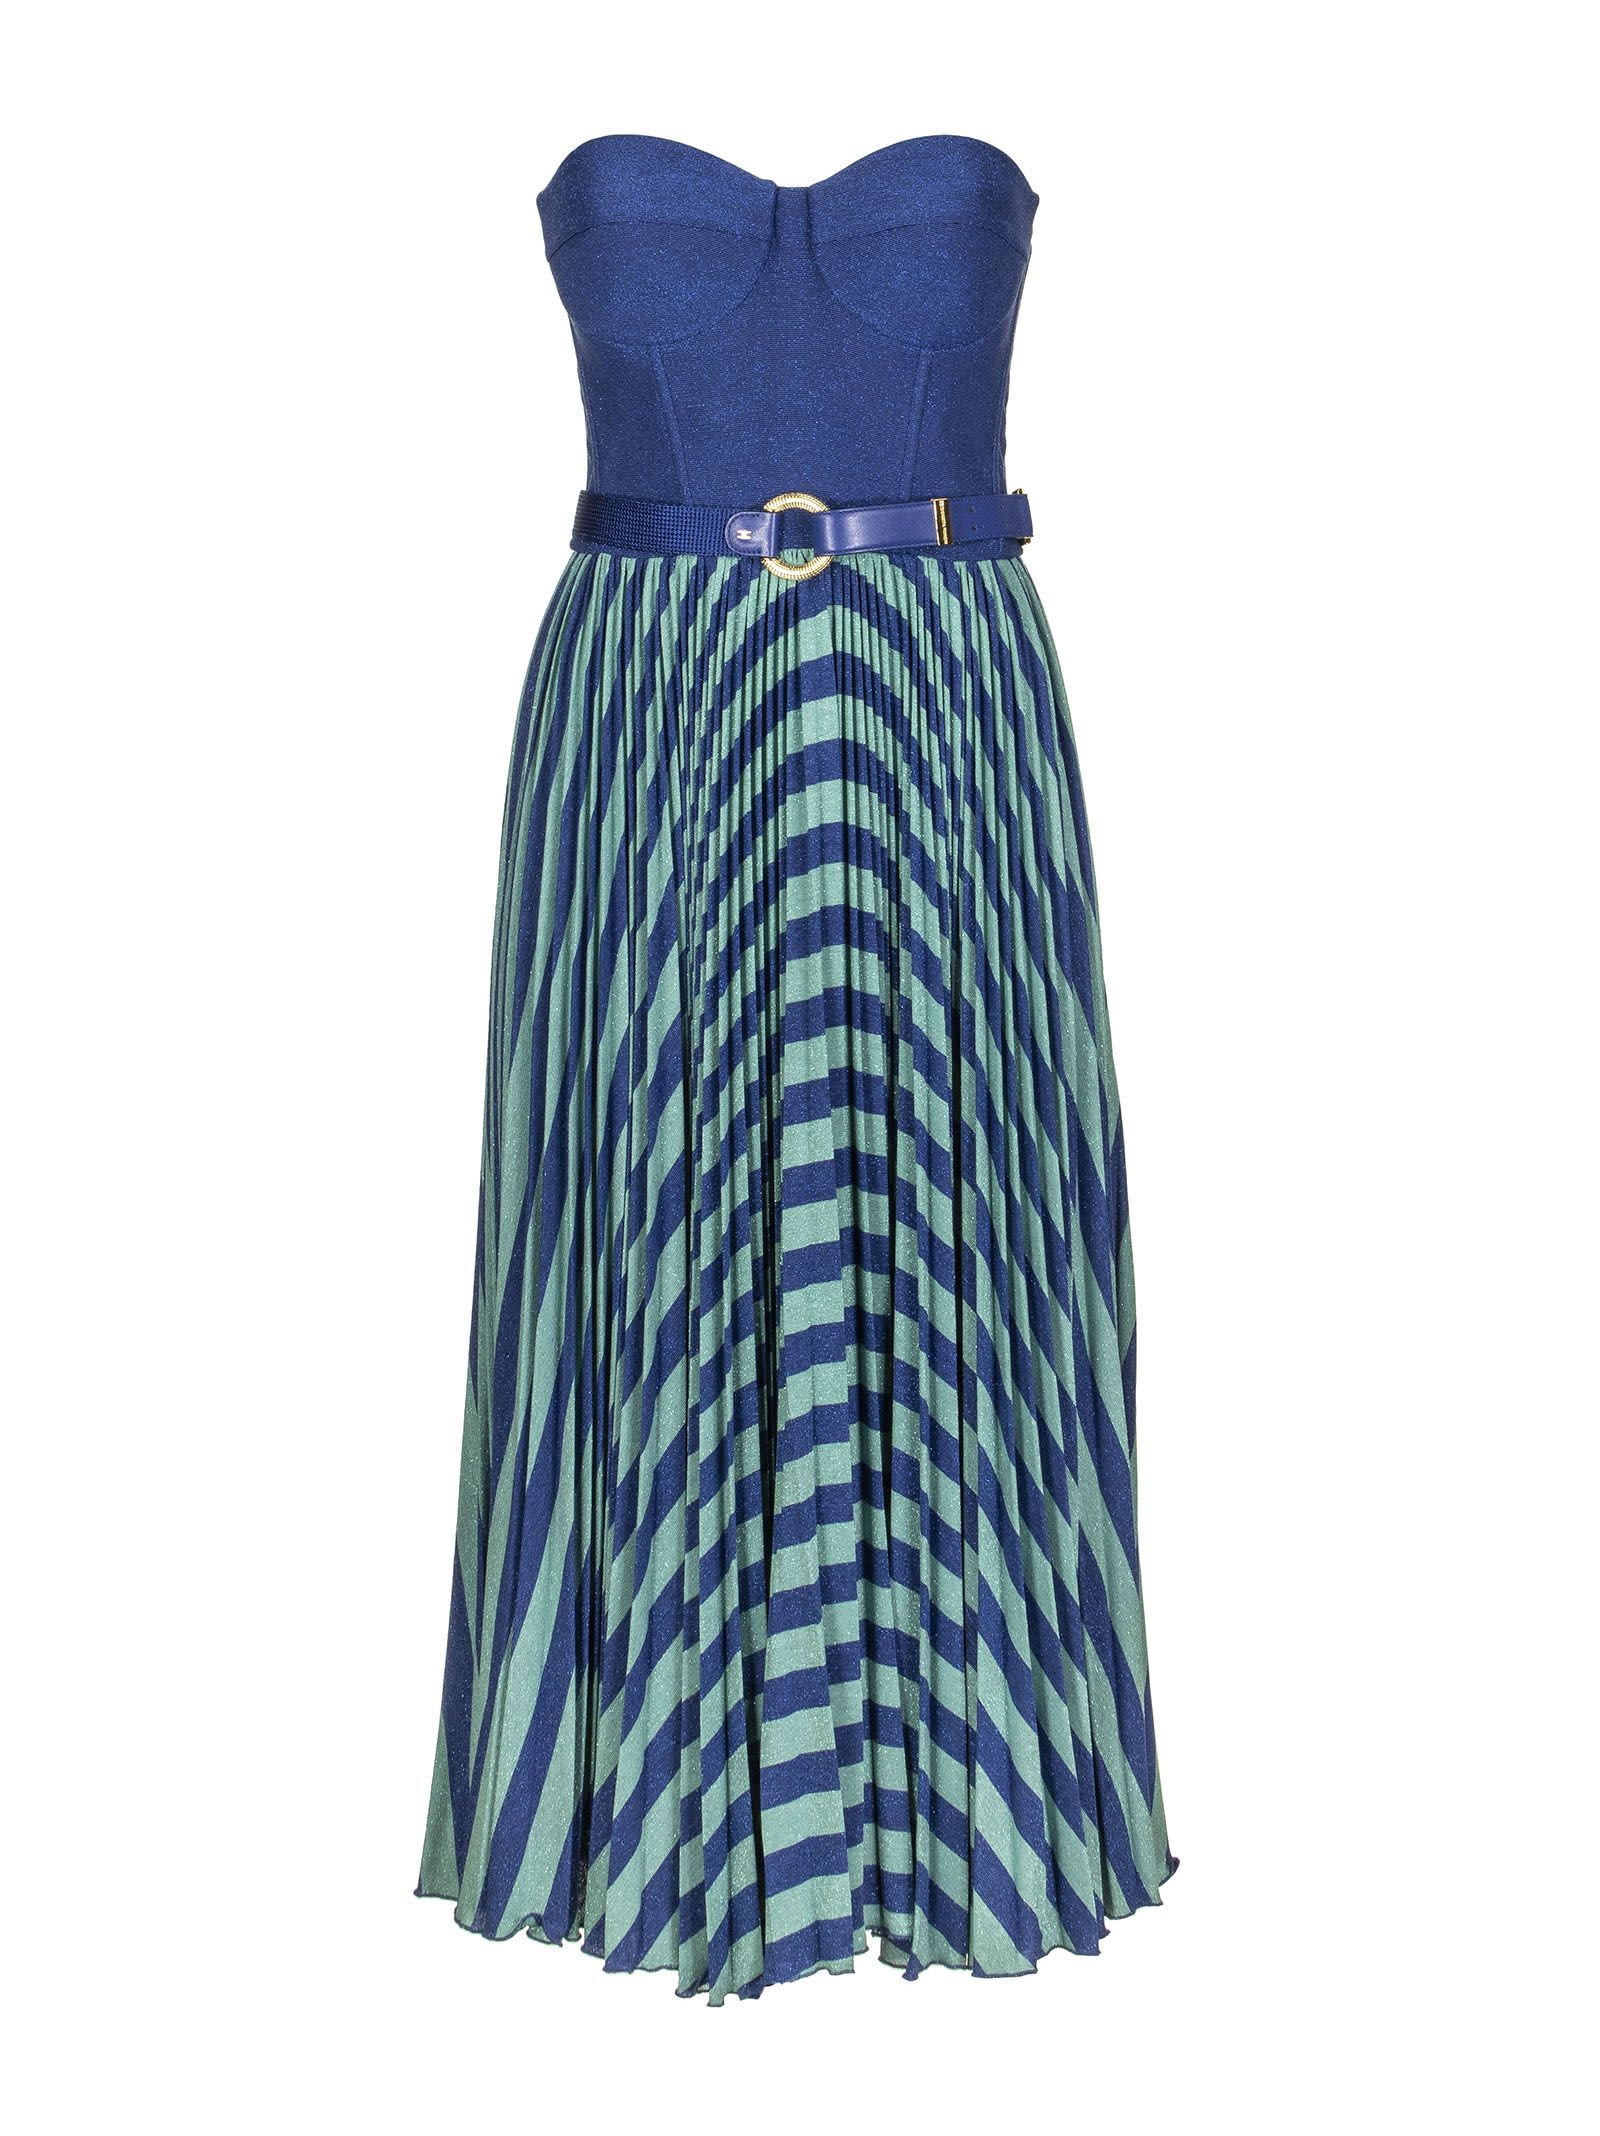 Elisabetta Franchi Sleeveless Dress With Belt